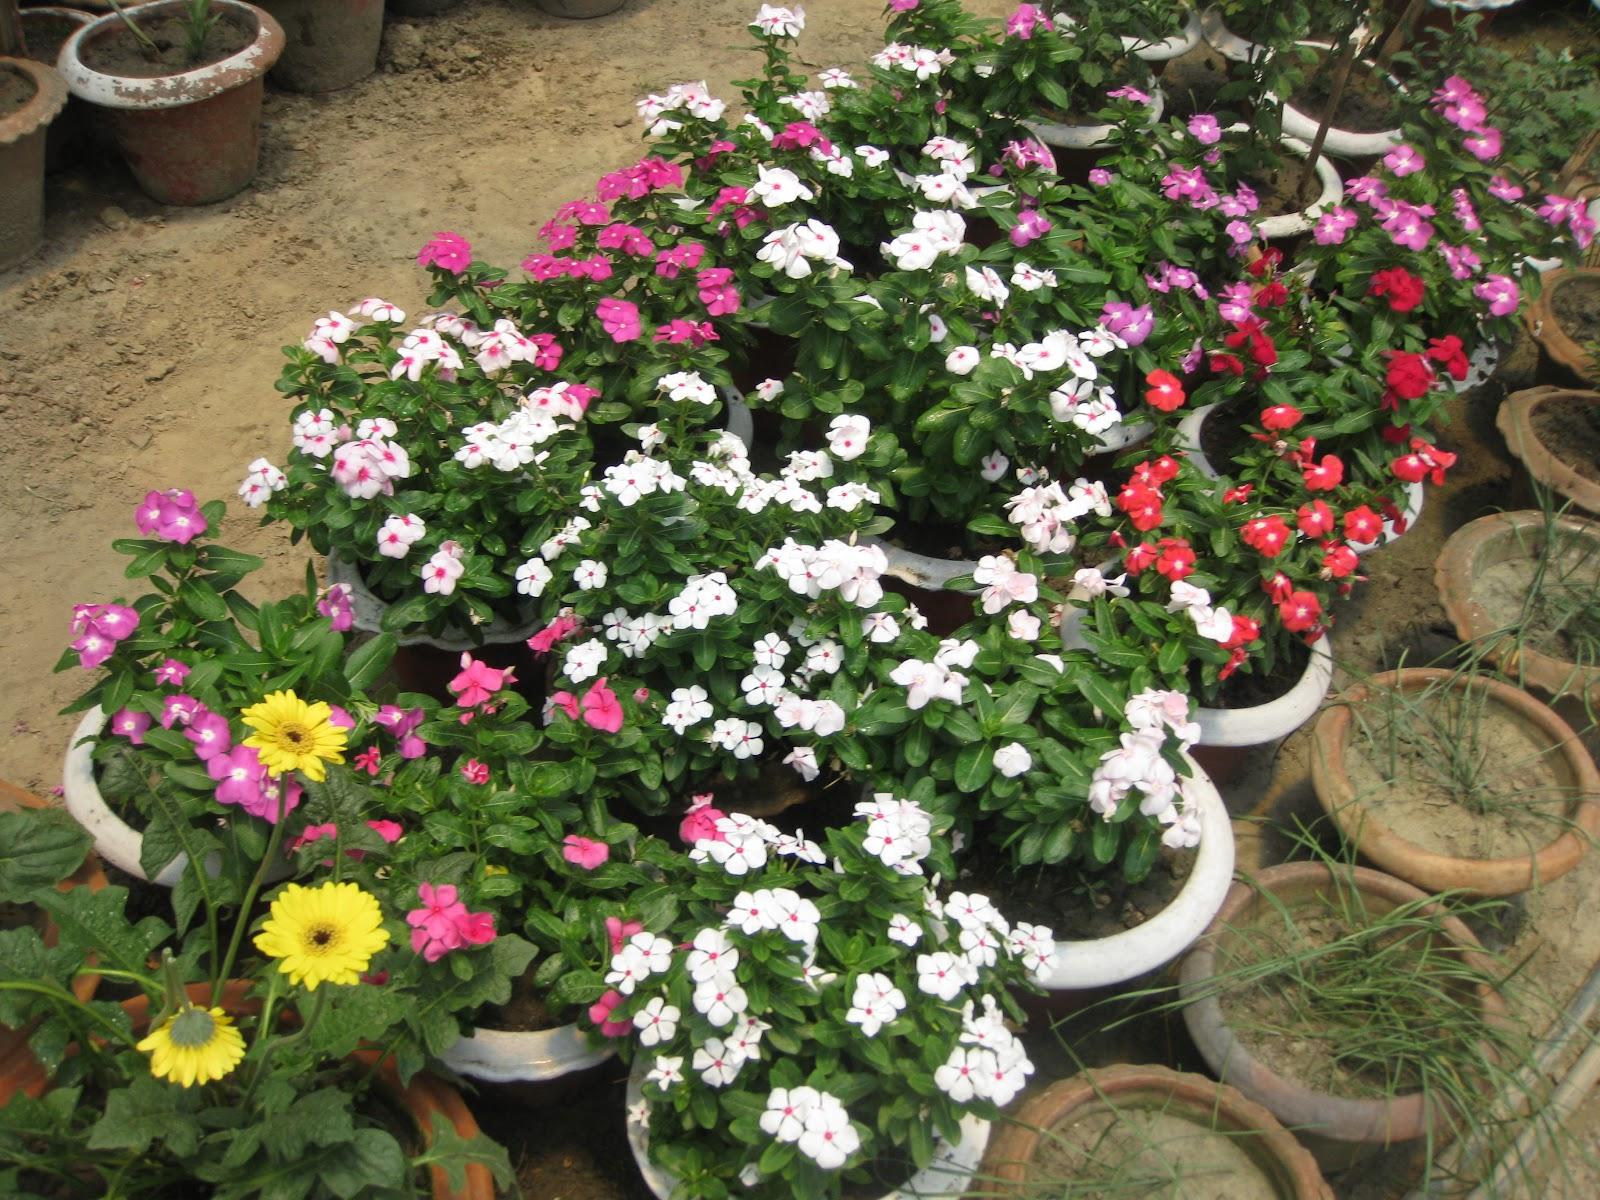 Perennial Flower Names This Flower Name Is Phlox